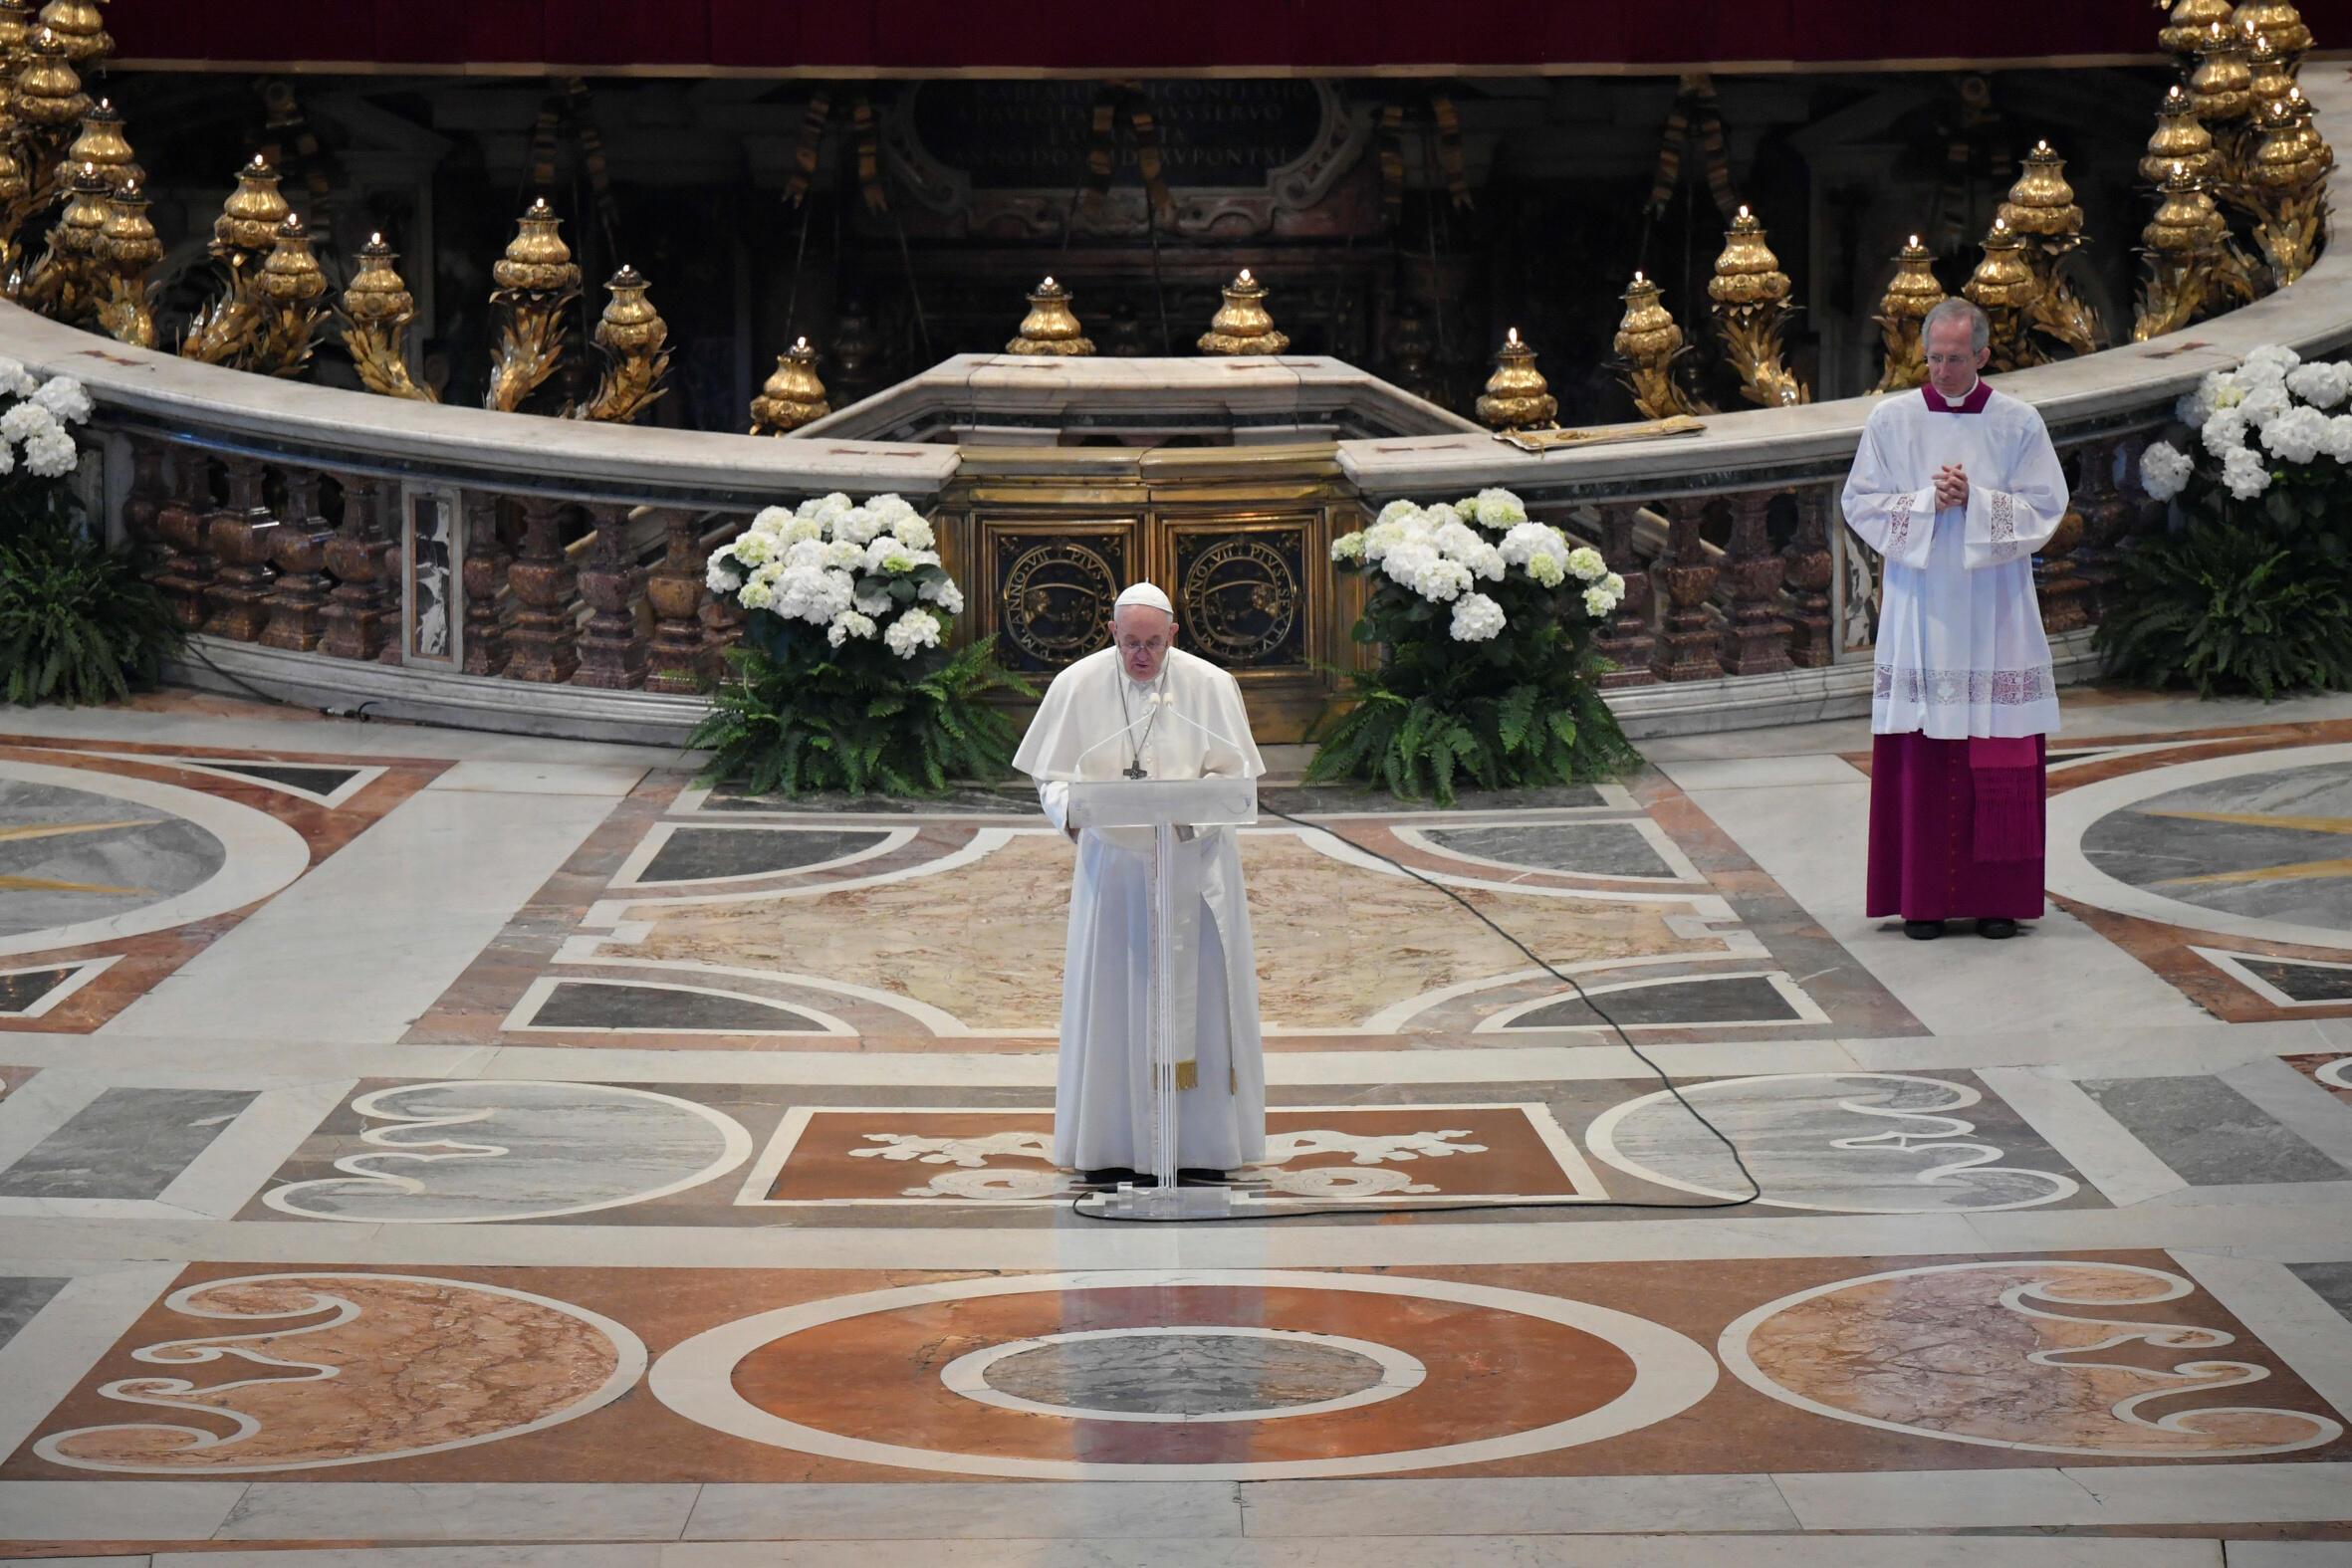 Pope François celebrating Easter Mass on his own on 12 avril 2020.